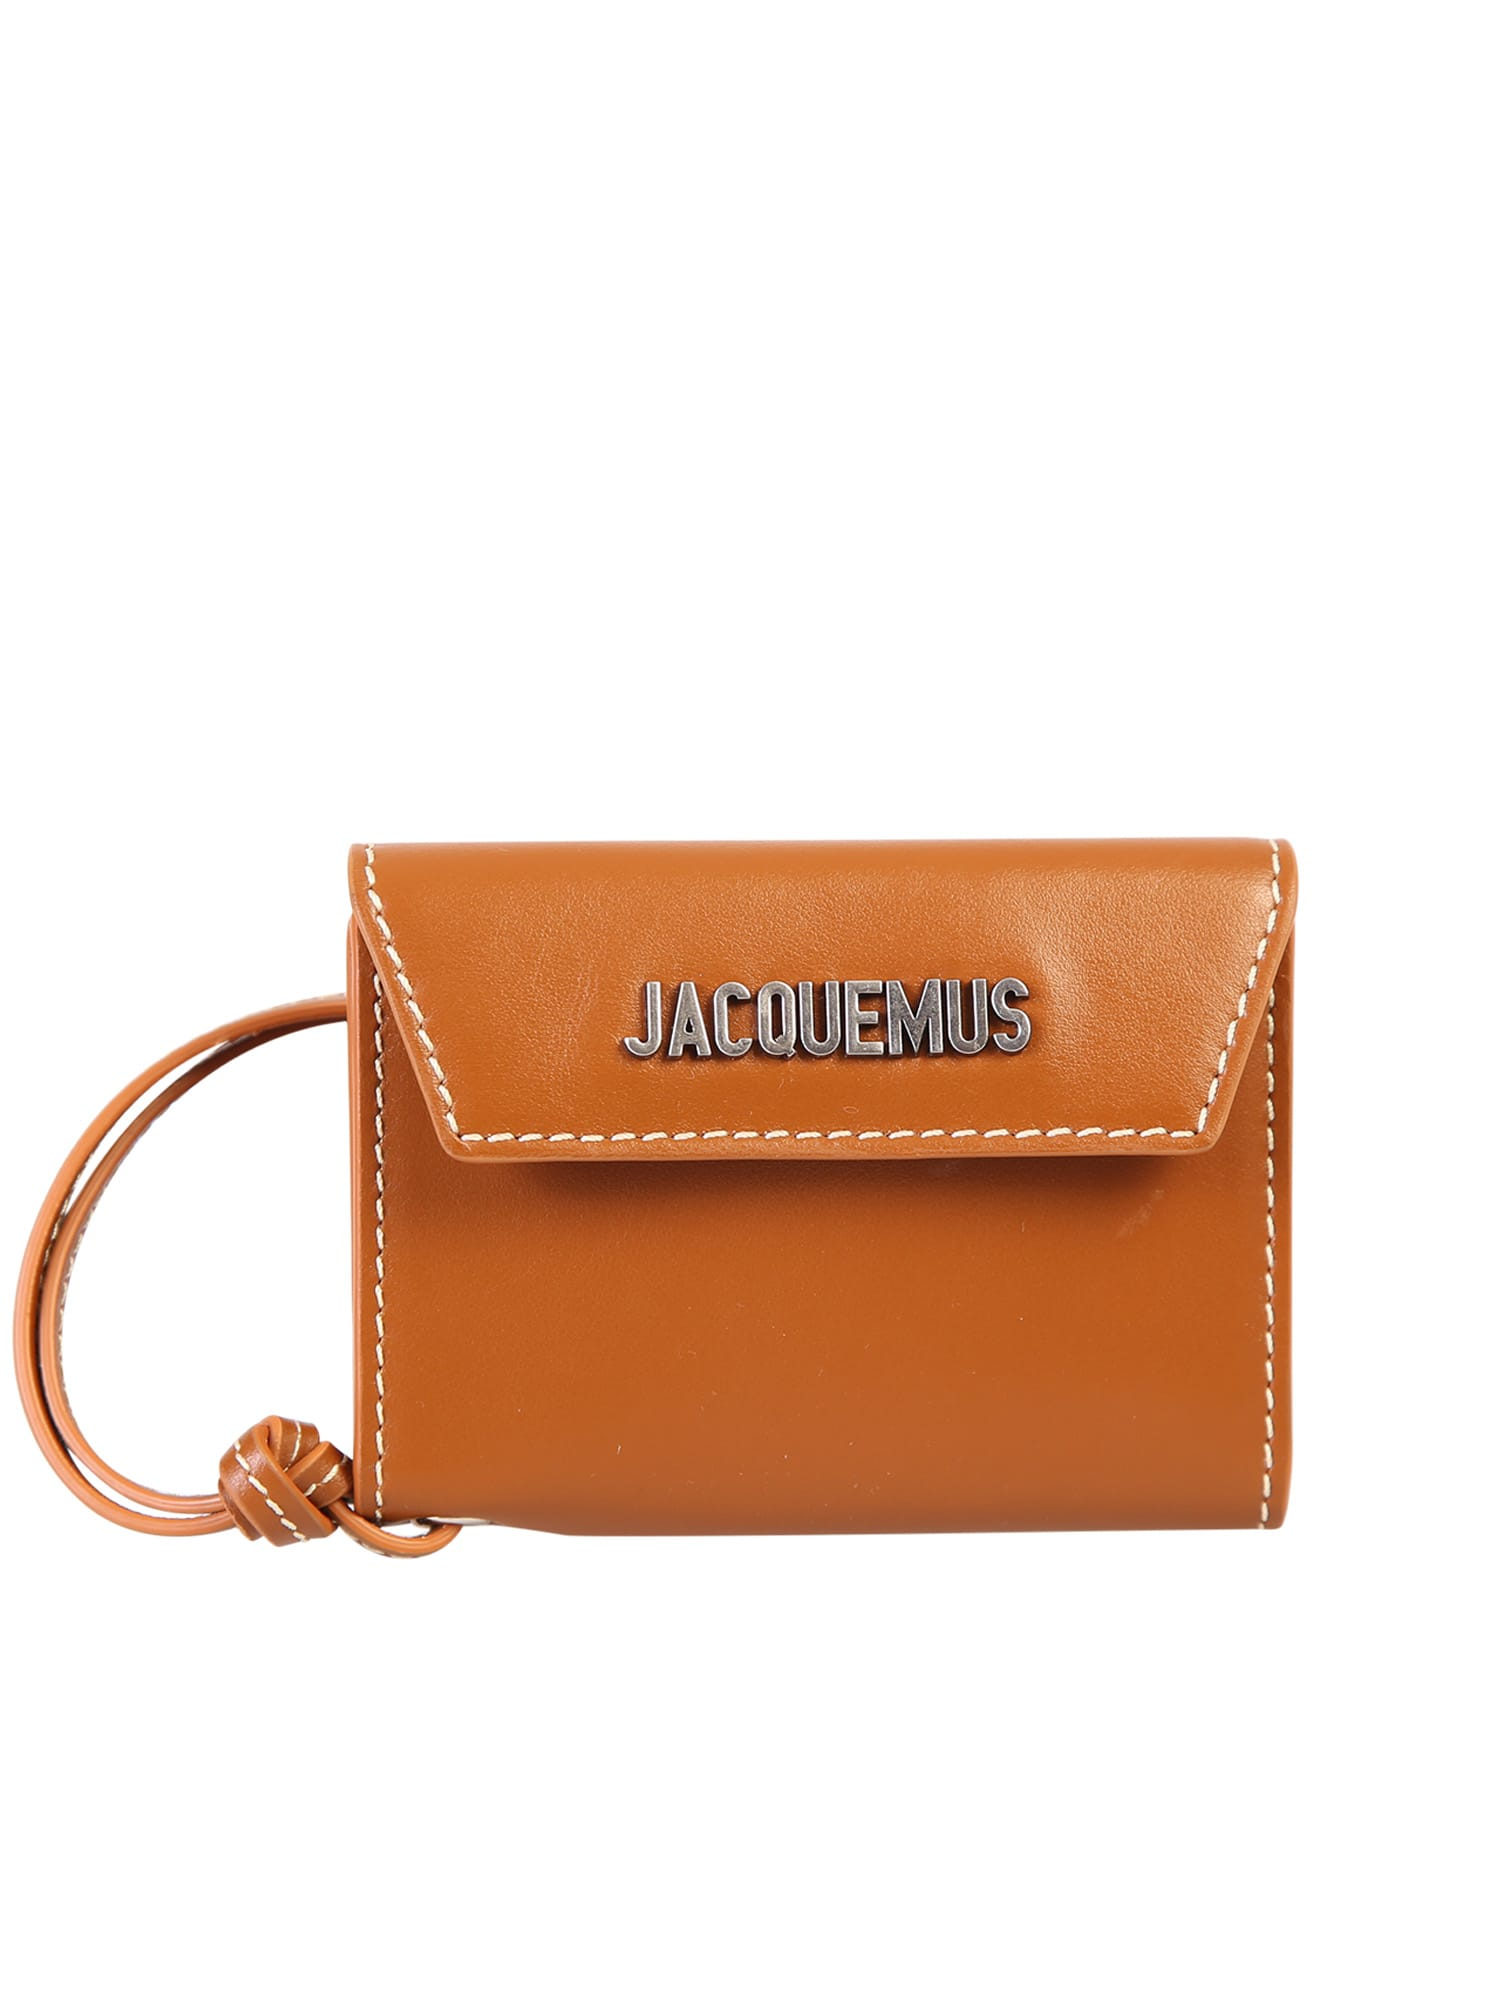 Jacquemus COIN PURSE